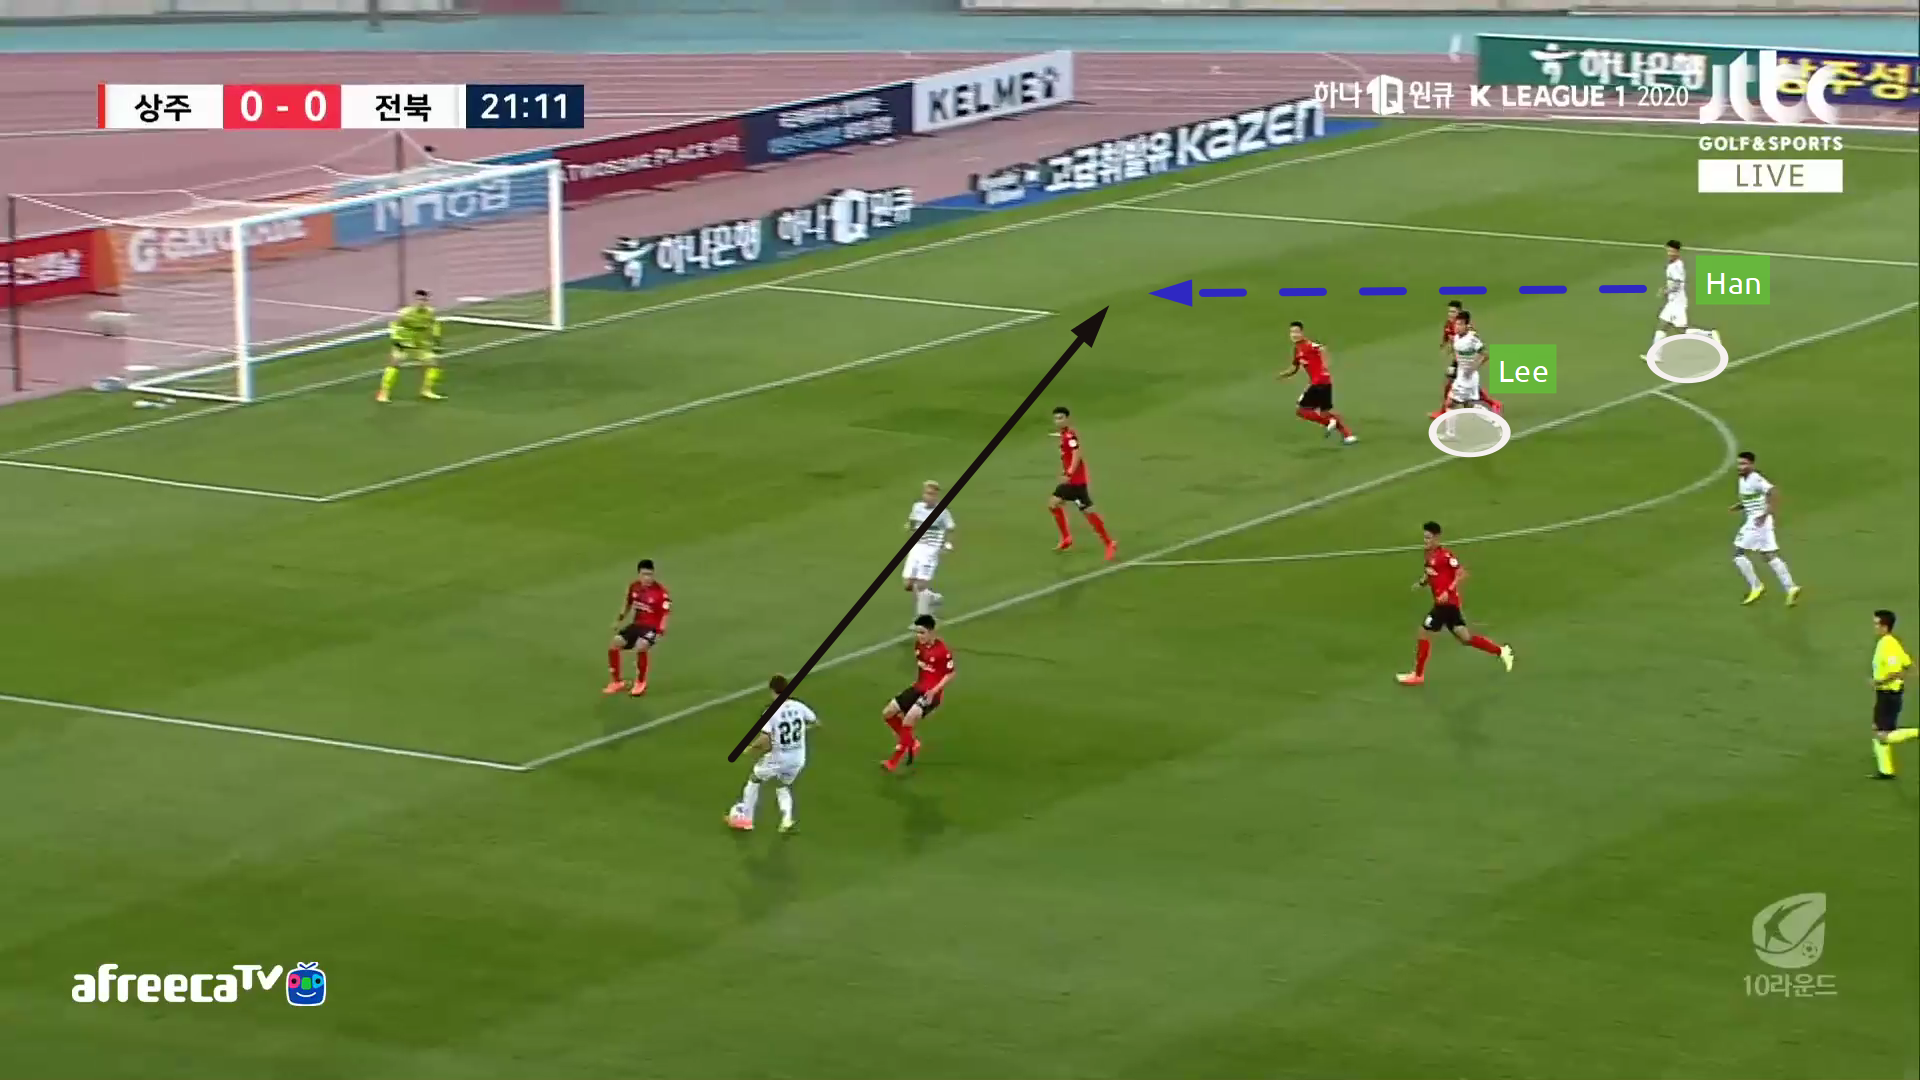 K-League 1 2020: Sangju Sangmu vs Jeonbuk Motors - tactical analysis tactics